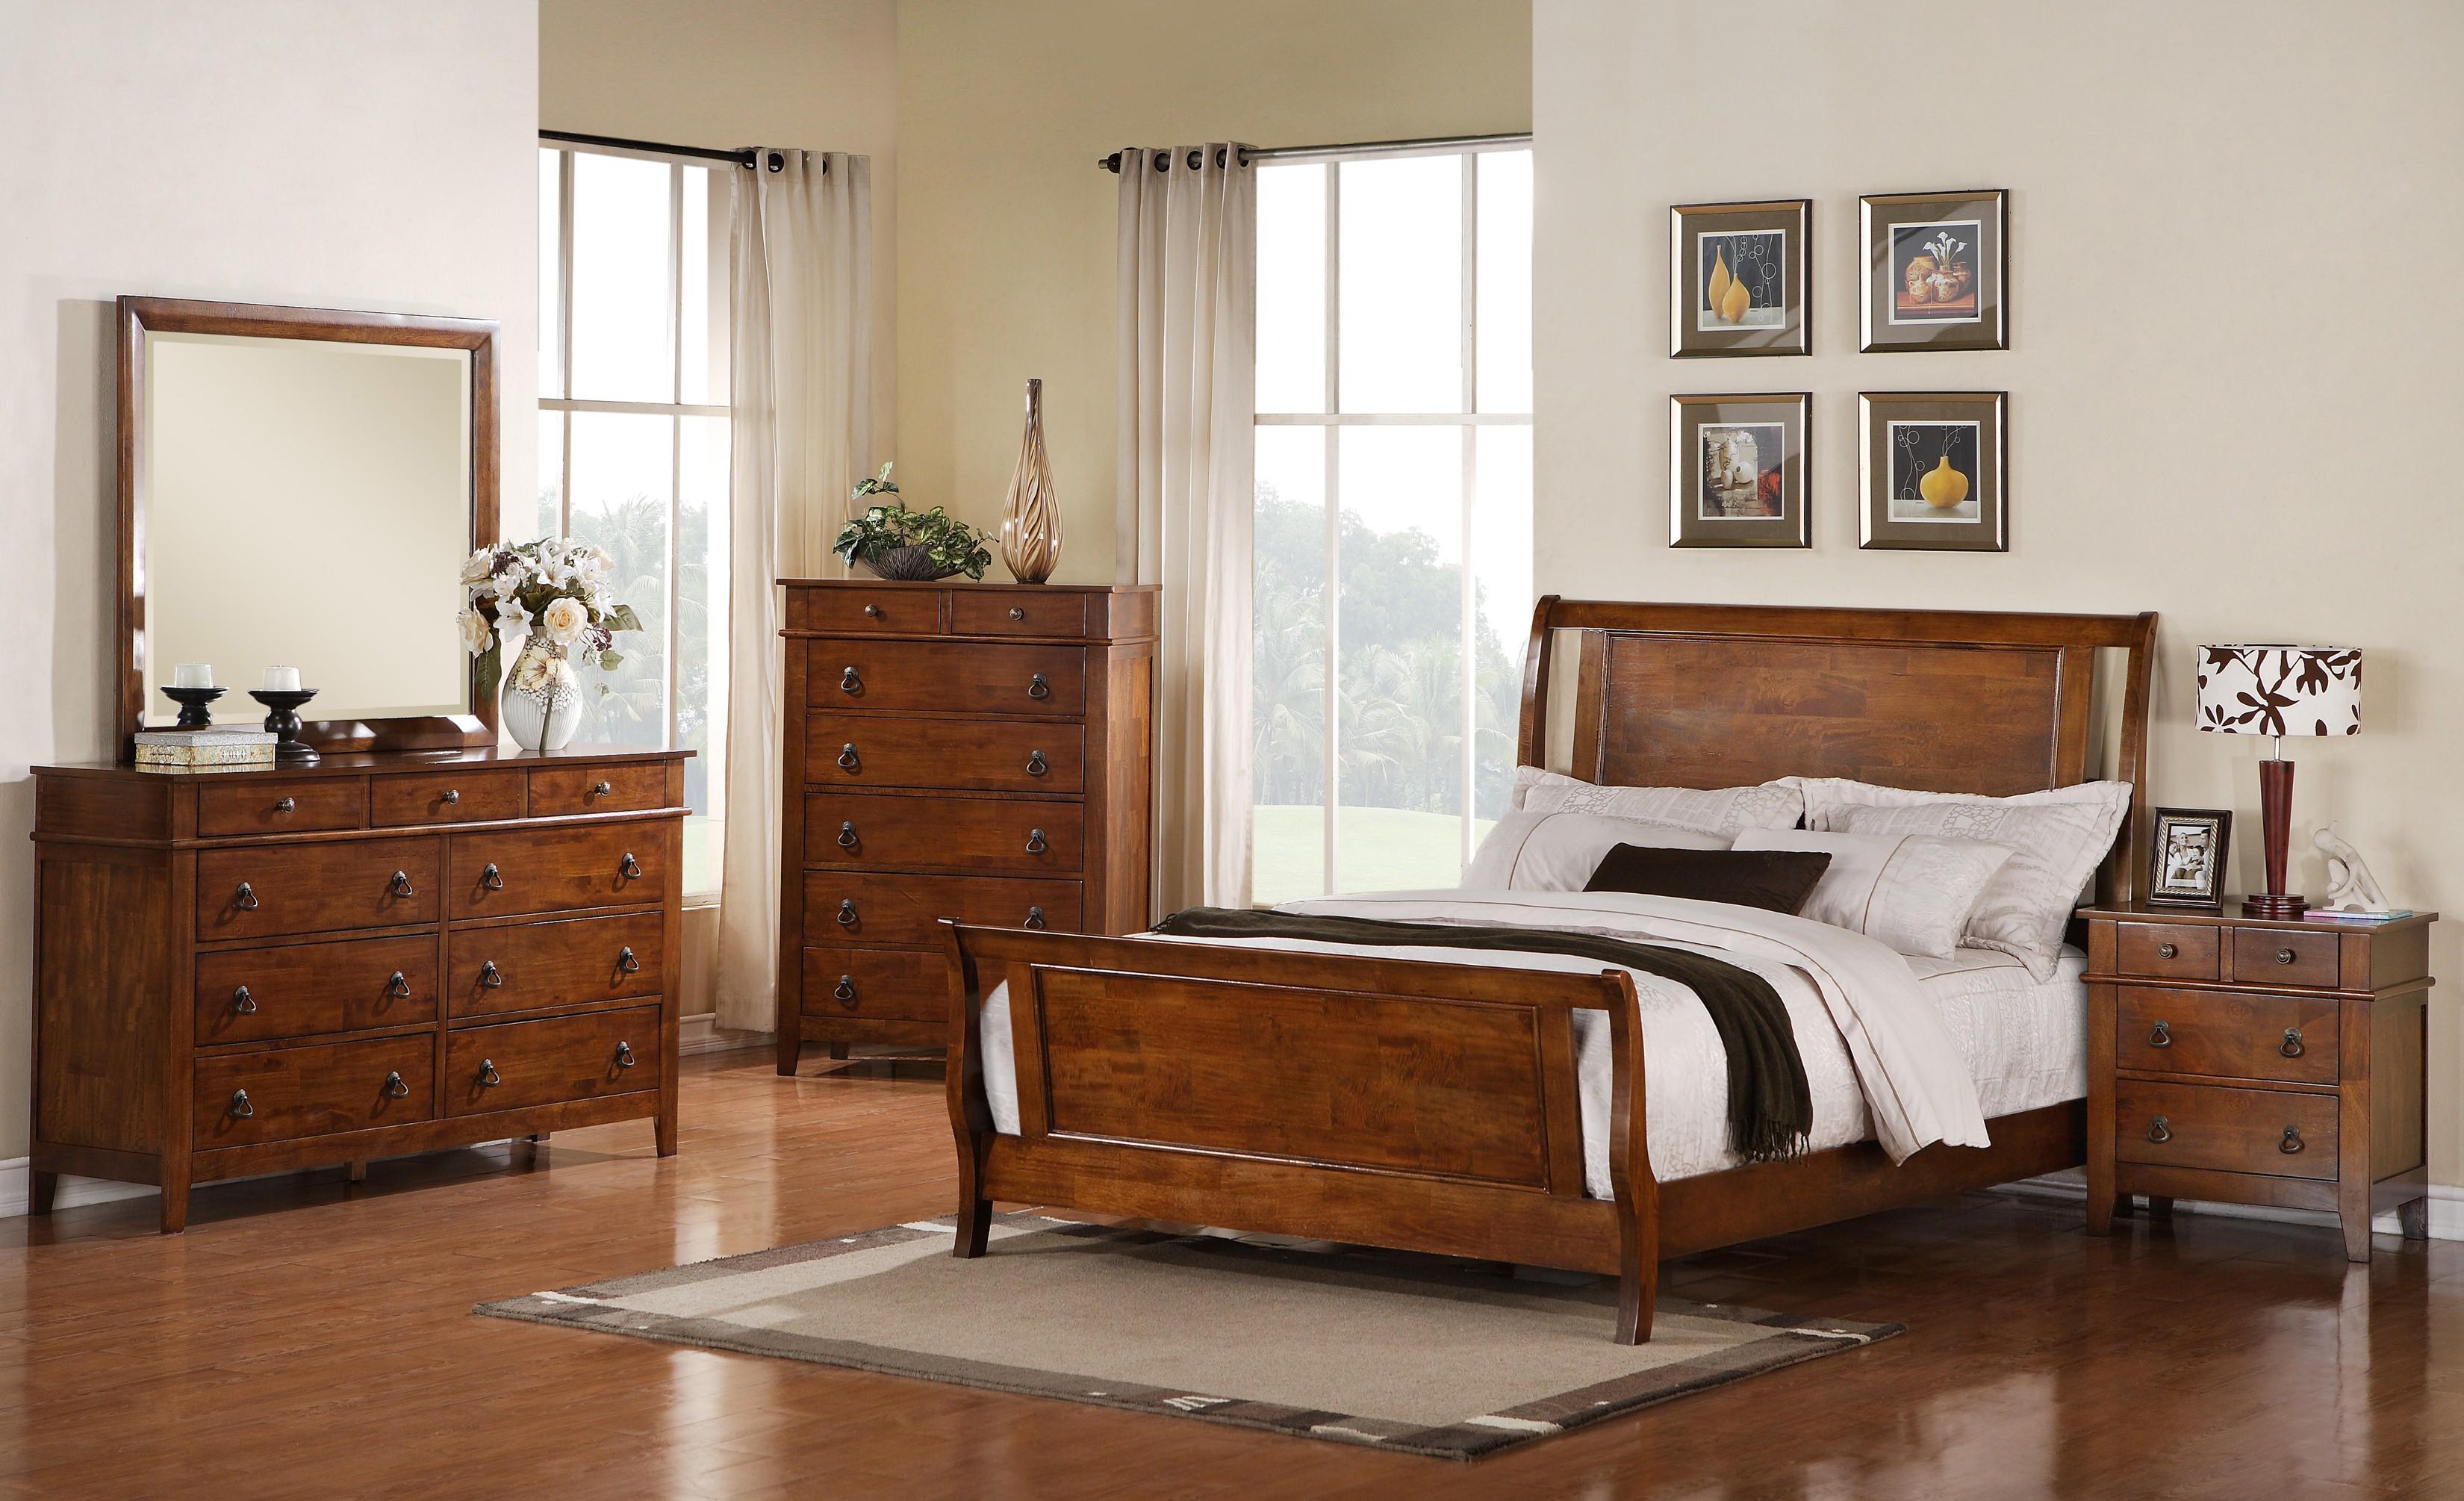 tucson transitional seven drawer chest dream home furniture drawer chests. Black Bedroom Furniture Sets. Home Design Ideas